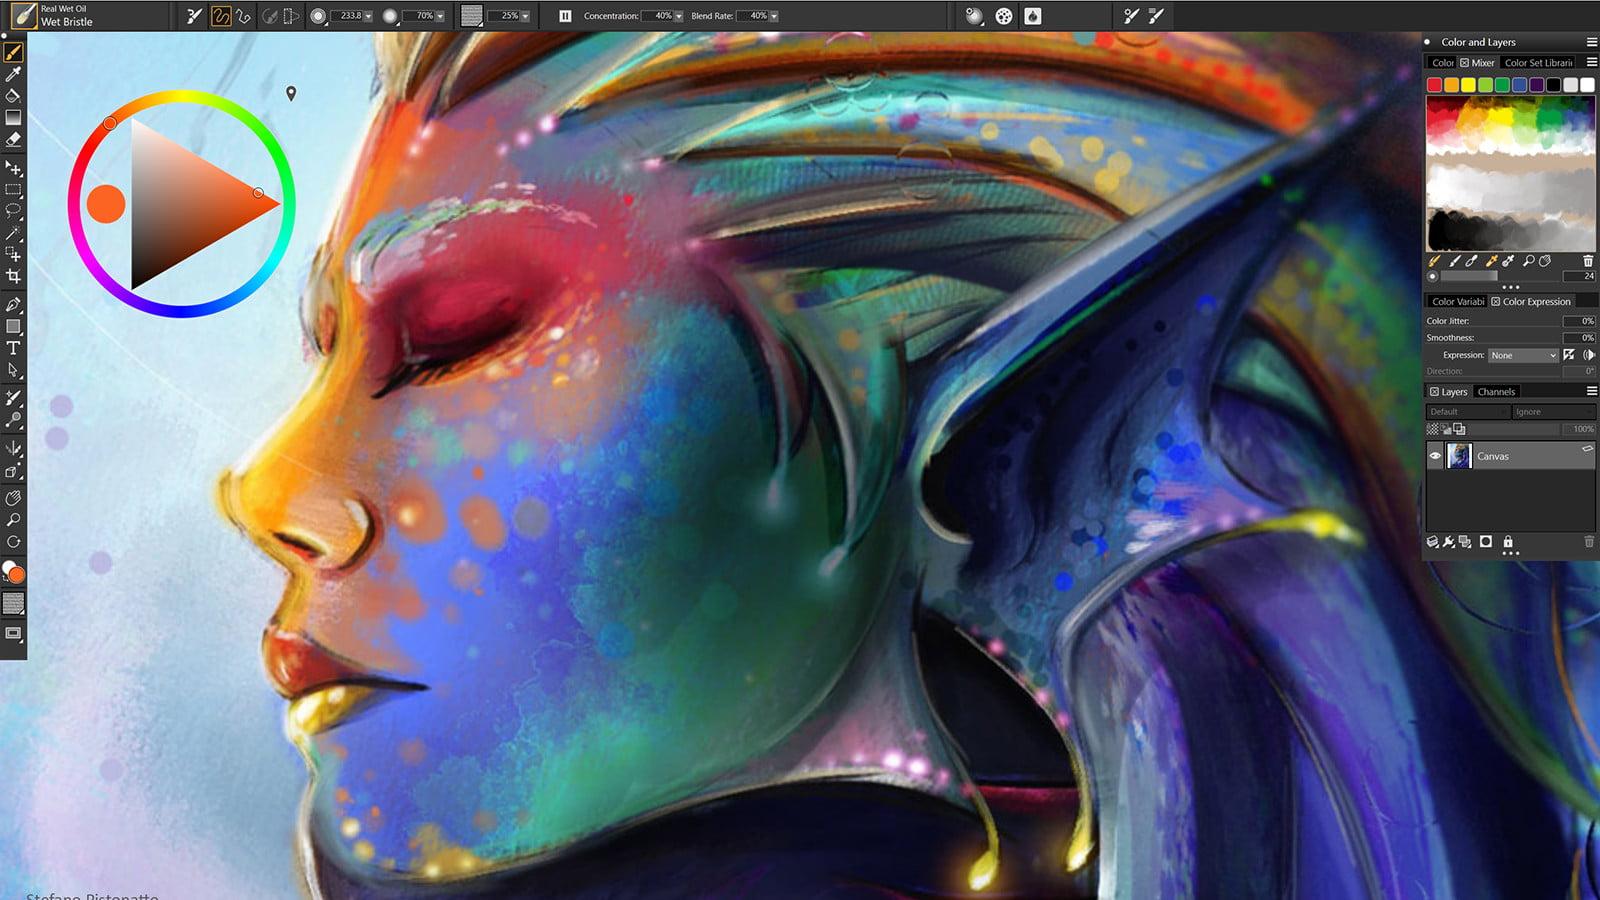 0uV4le7n_o - Corel Painter 2019 19.0.0.427 [Arte Digital] [x64] [UL-NF-U4E] - Descargas en general